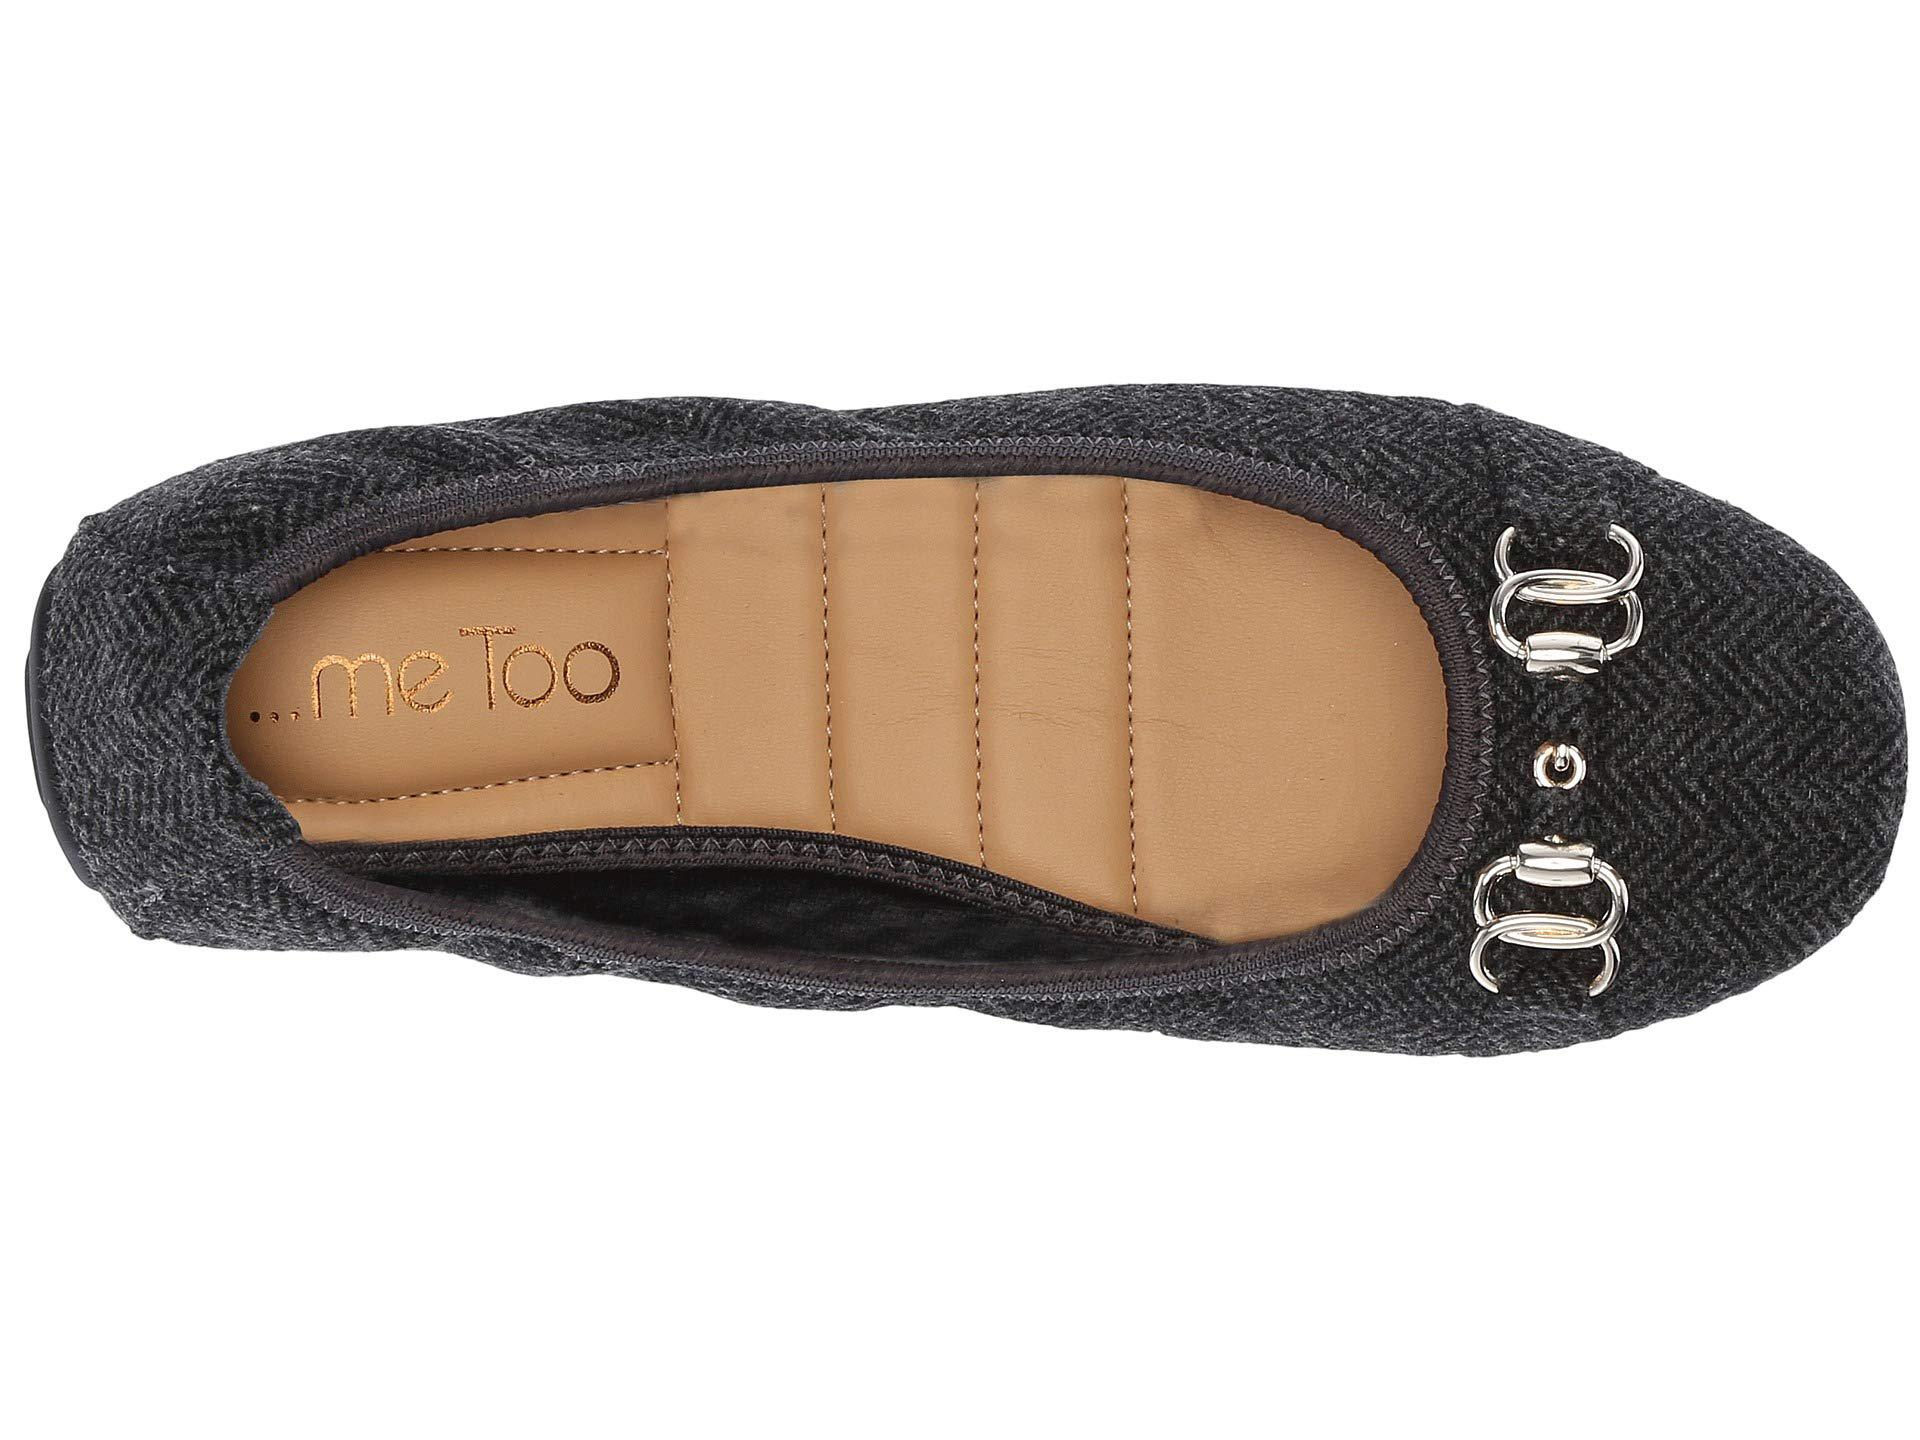 80ef1eb328f7 Me Too - Olympia (tan/black Mini Jag Haircalf) Women's Shoes - Lyst. View  fullscreen